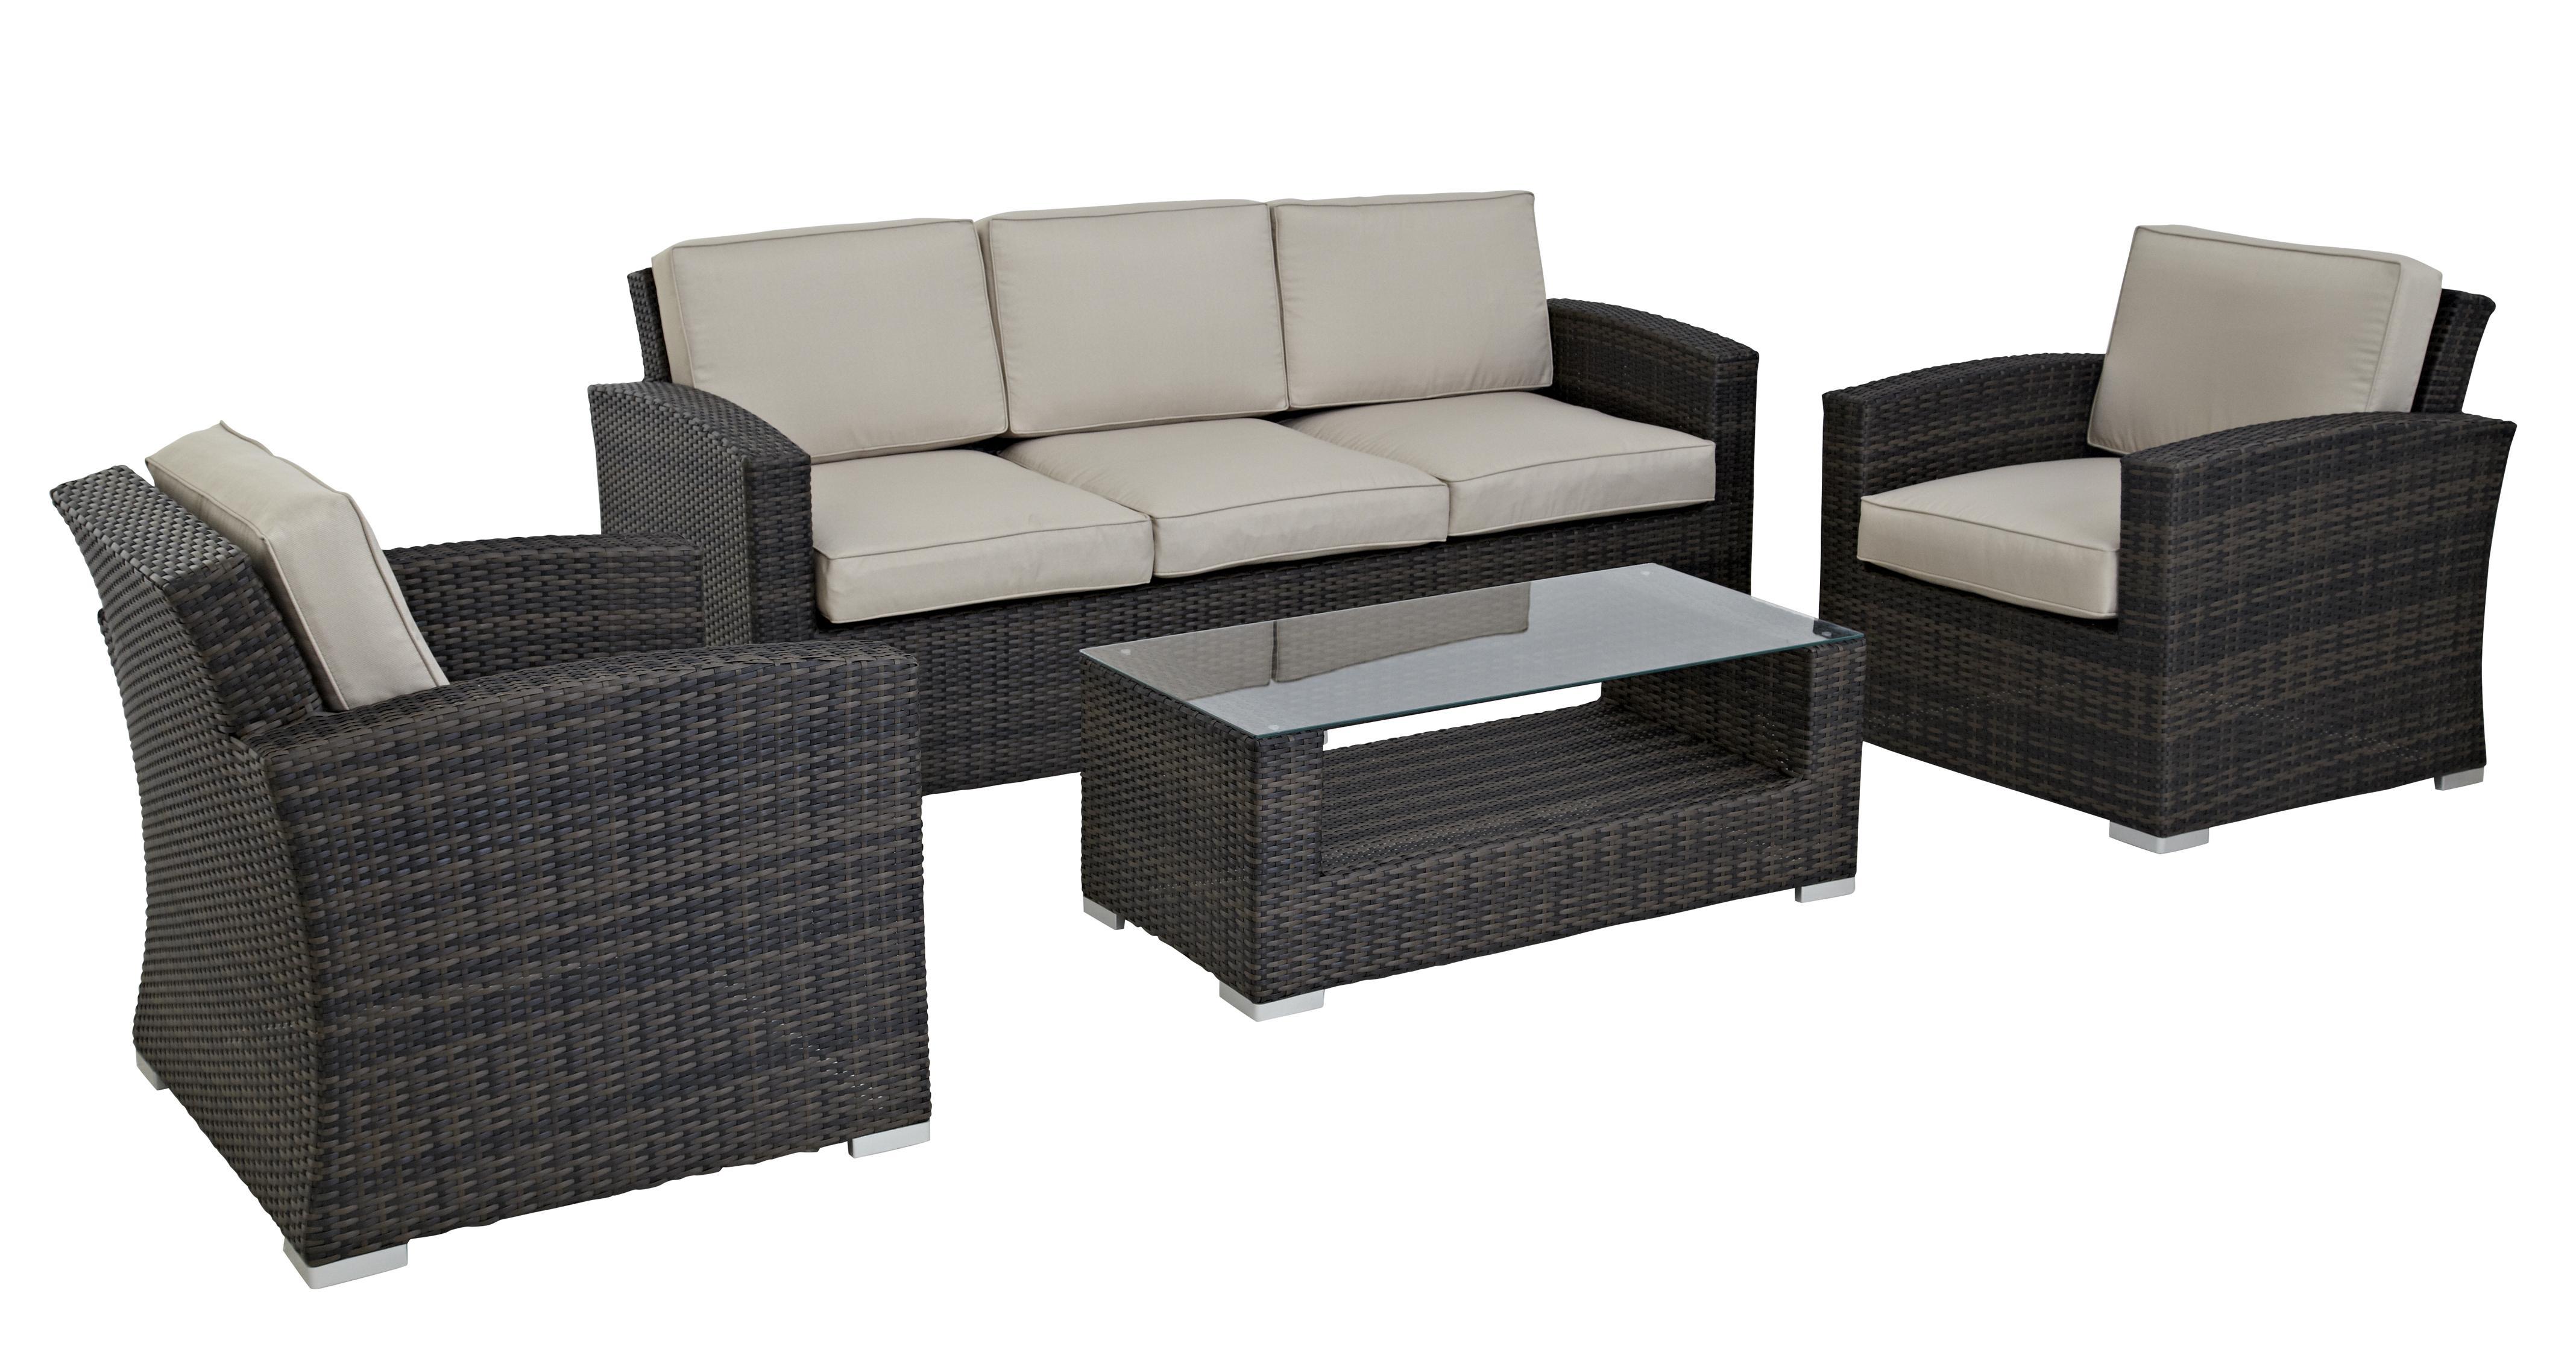 Palma 3 Seater Sofa Set PU Rattan